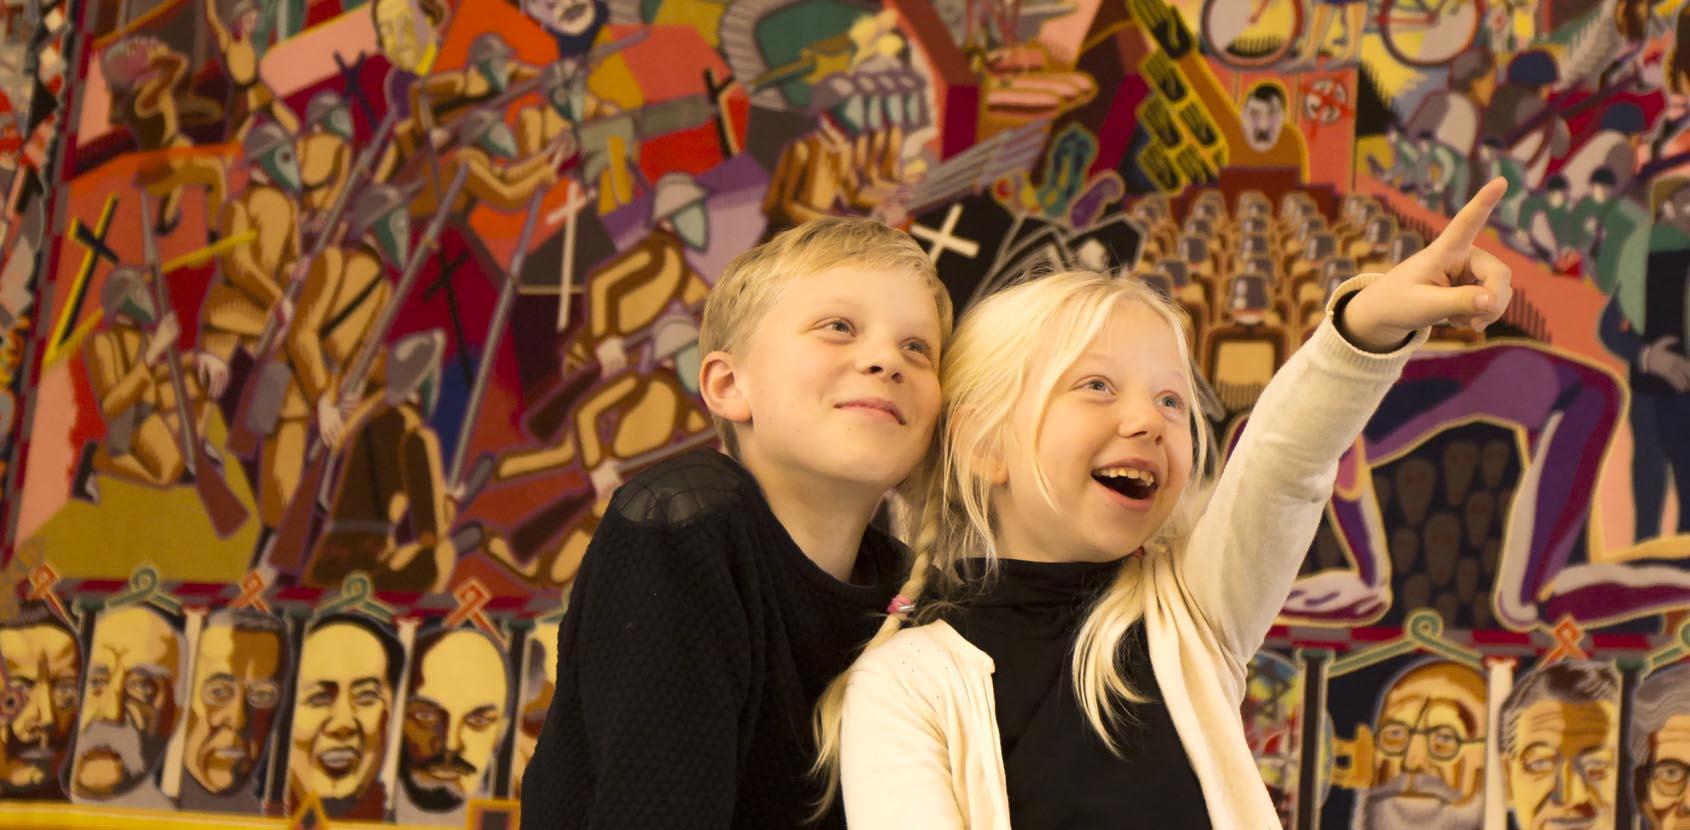 Børn i Riddersalen-Christiansborg Slot_Thorkild Jensen